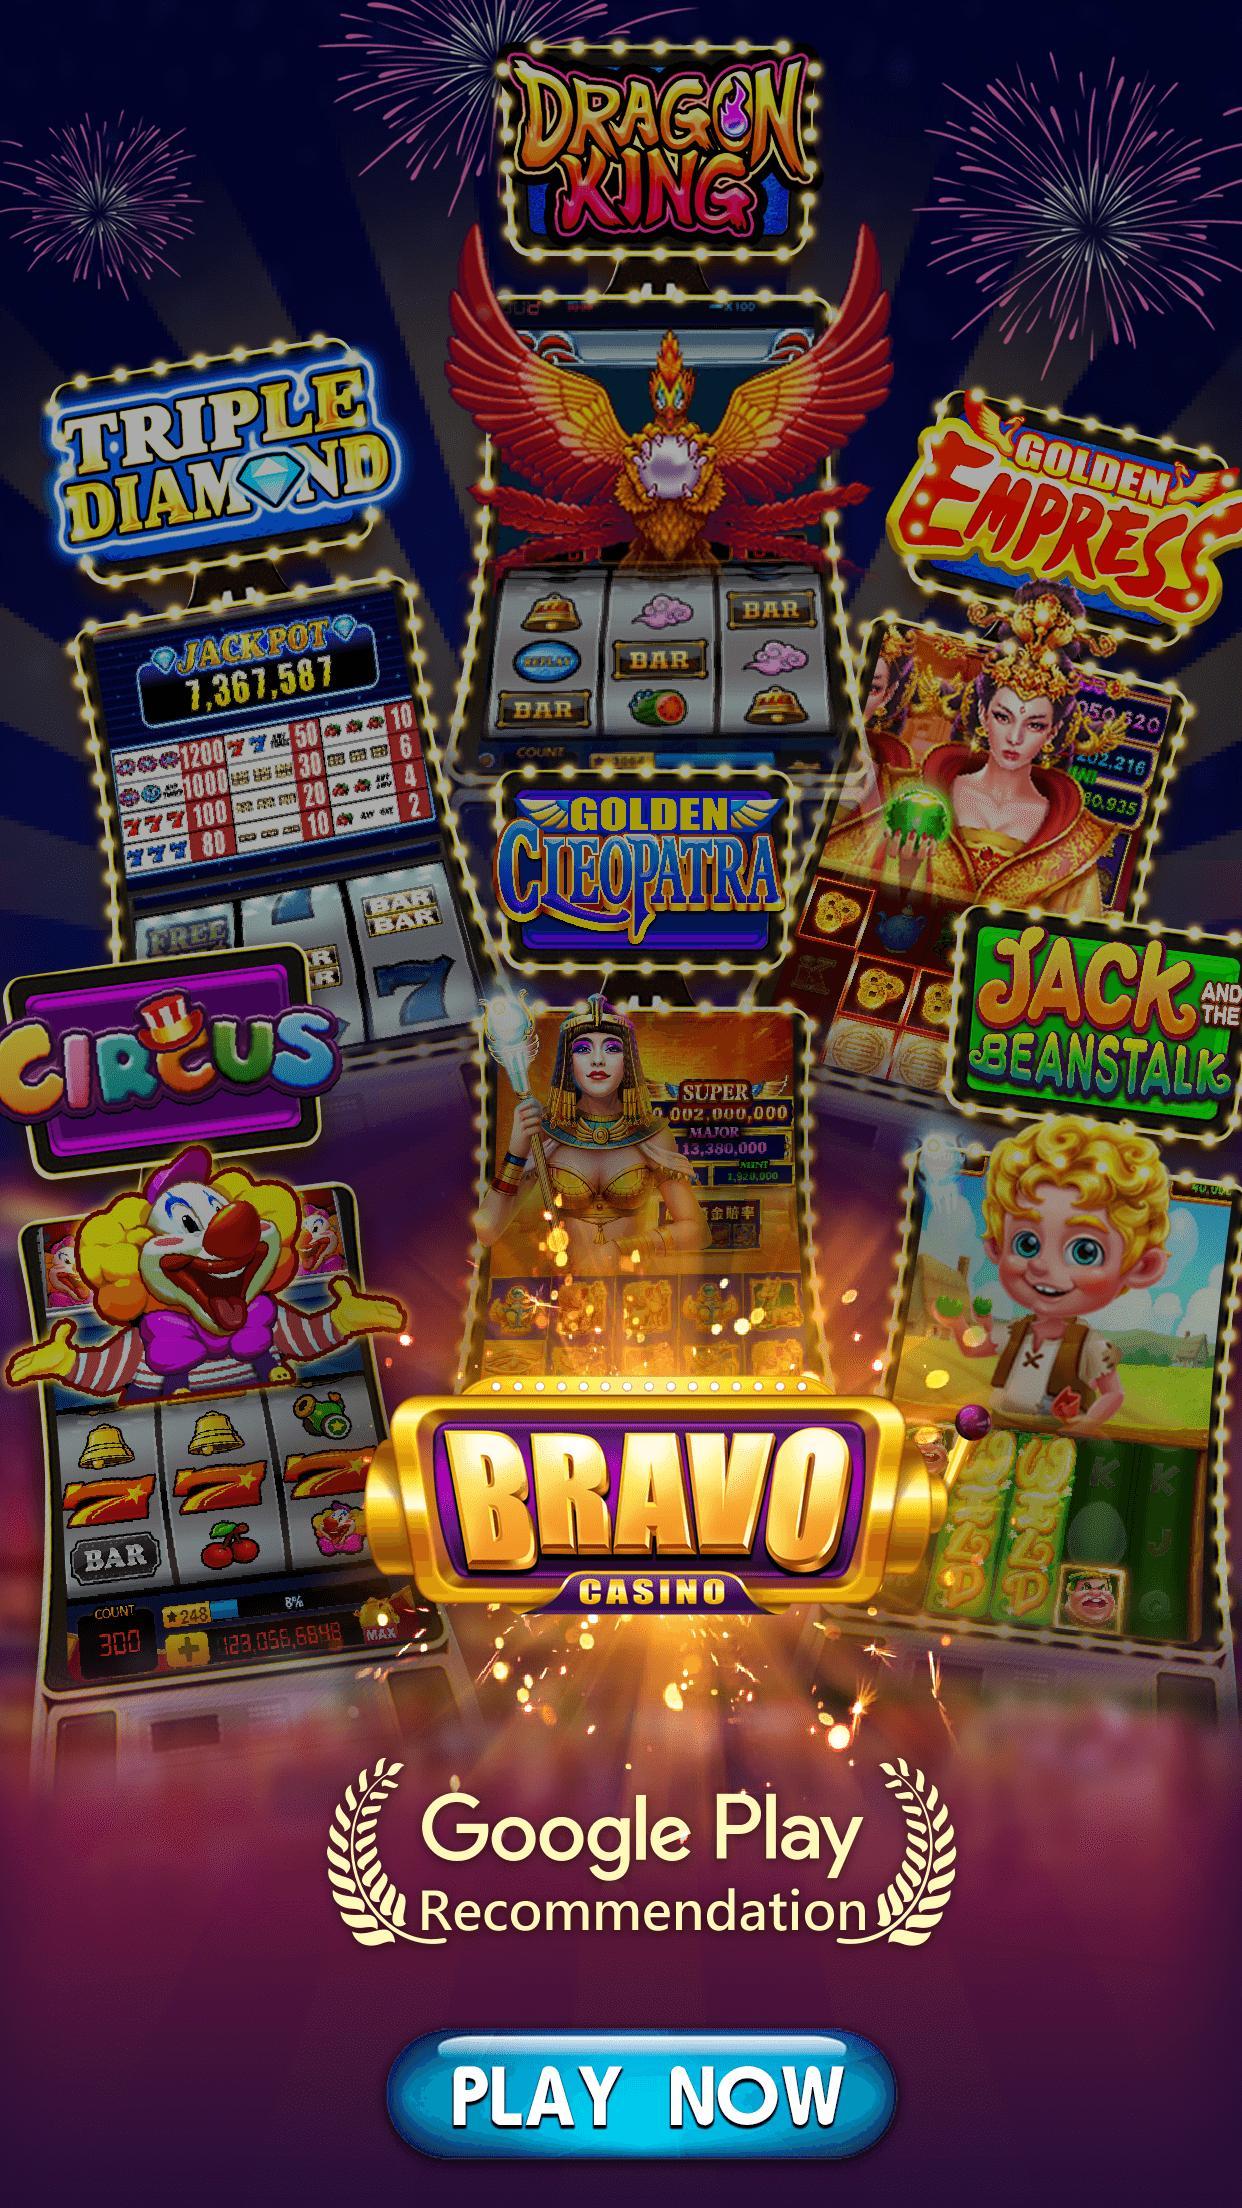 Casino Bravo